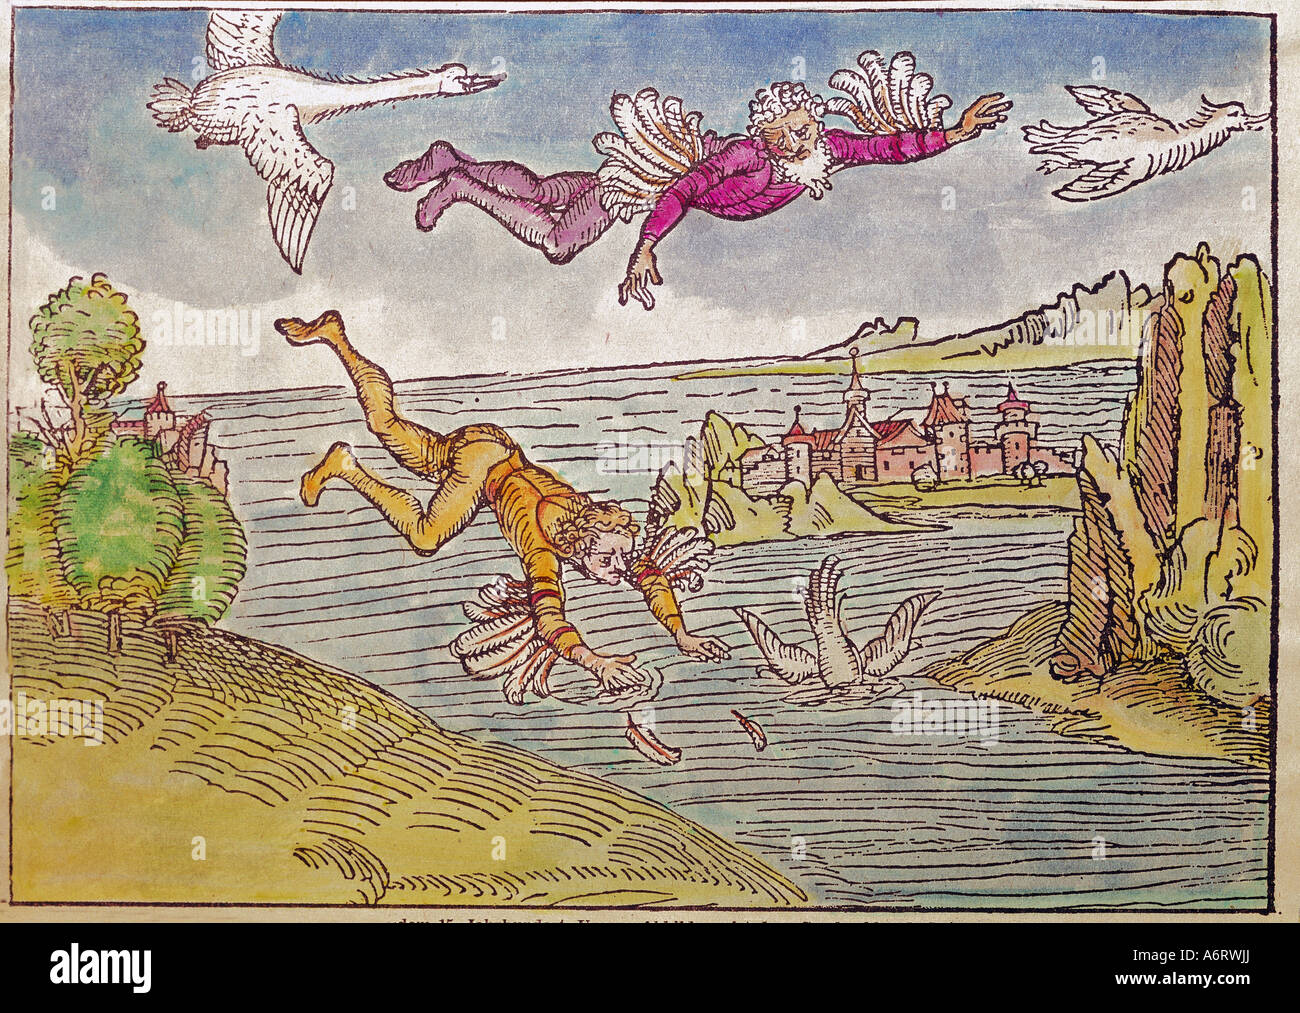 Icarus and Daedalus, Greek mythological figures, fall of Icarus, coloured woodcut, Nuremberg or Augsburg, circa - Stock Image